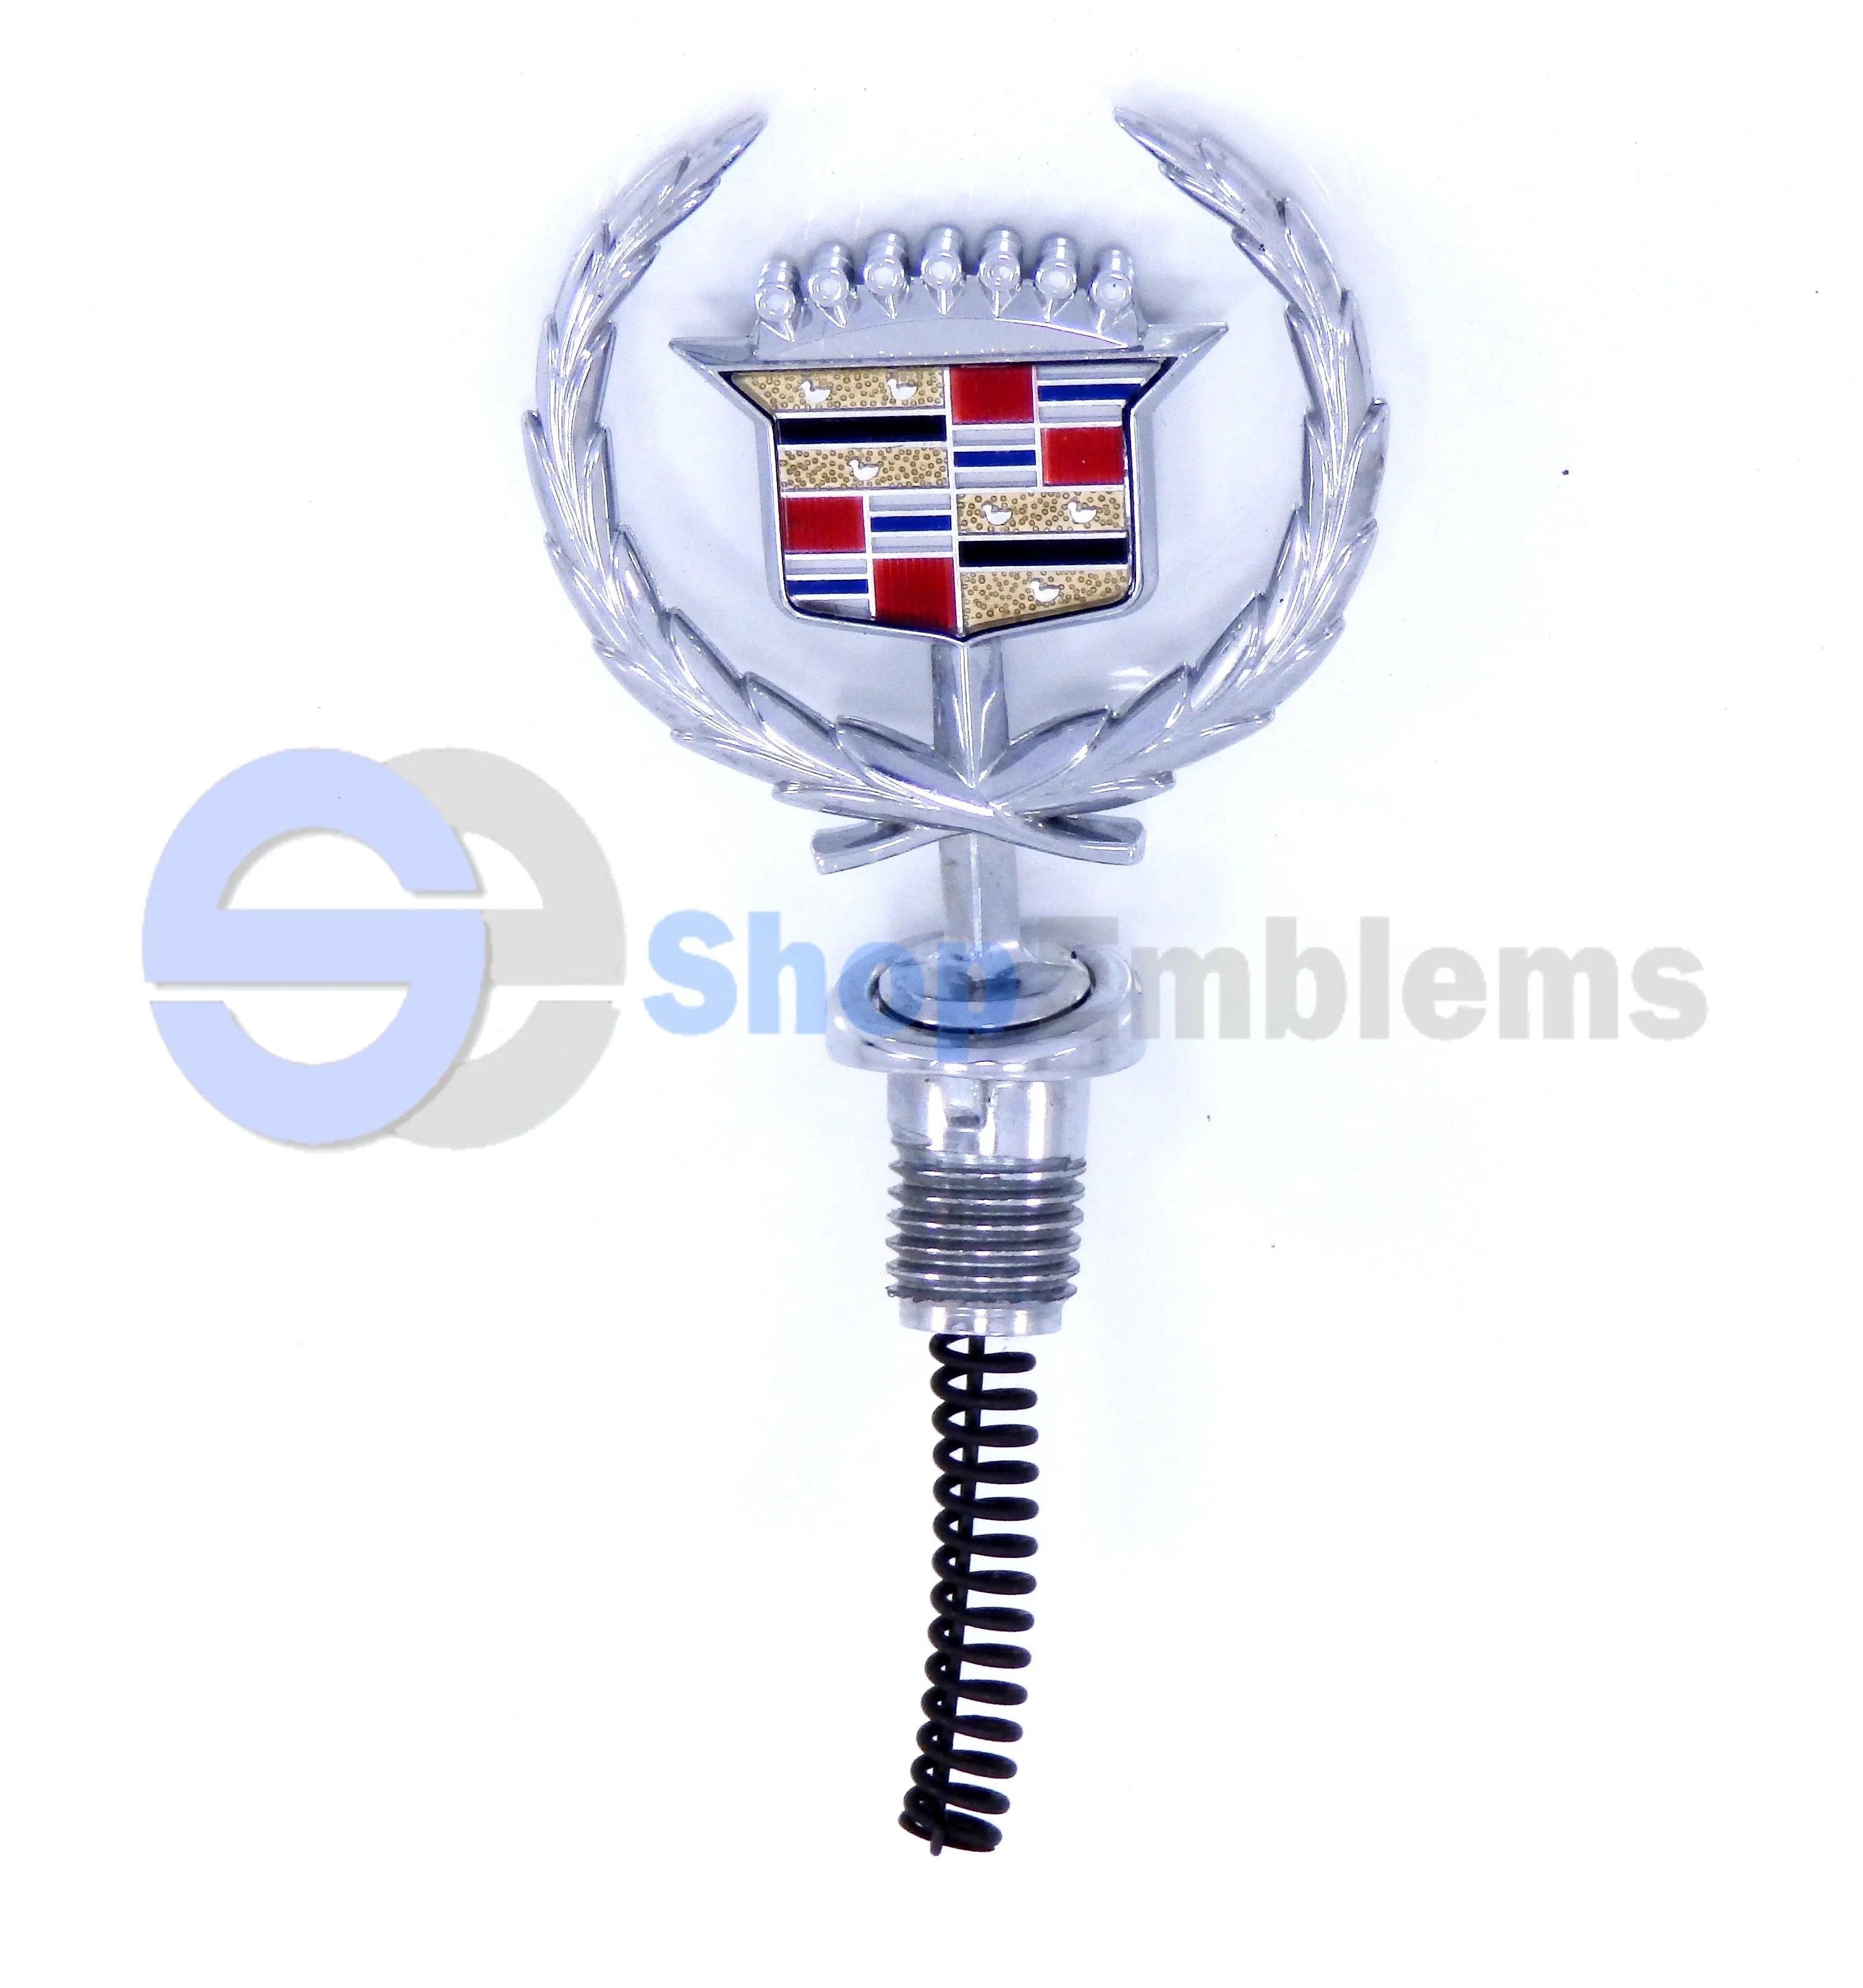 hight resolution of 89 90 91 92 93 cadillac fleetwood deville hood ornament logo emblem badge oem nameplate crest